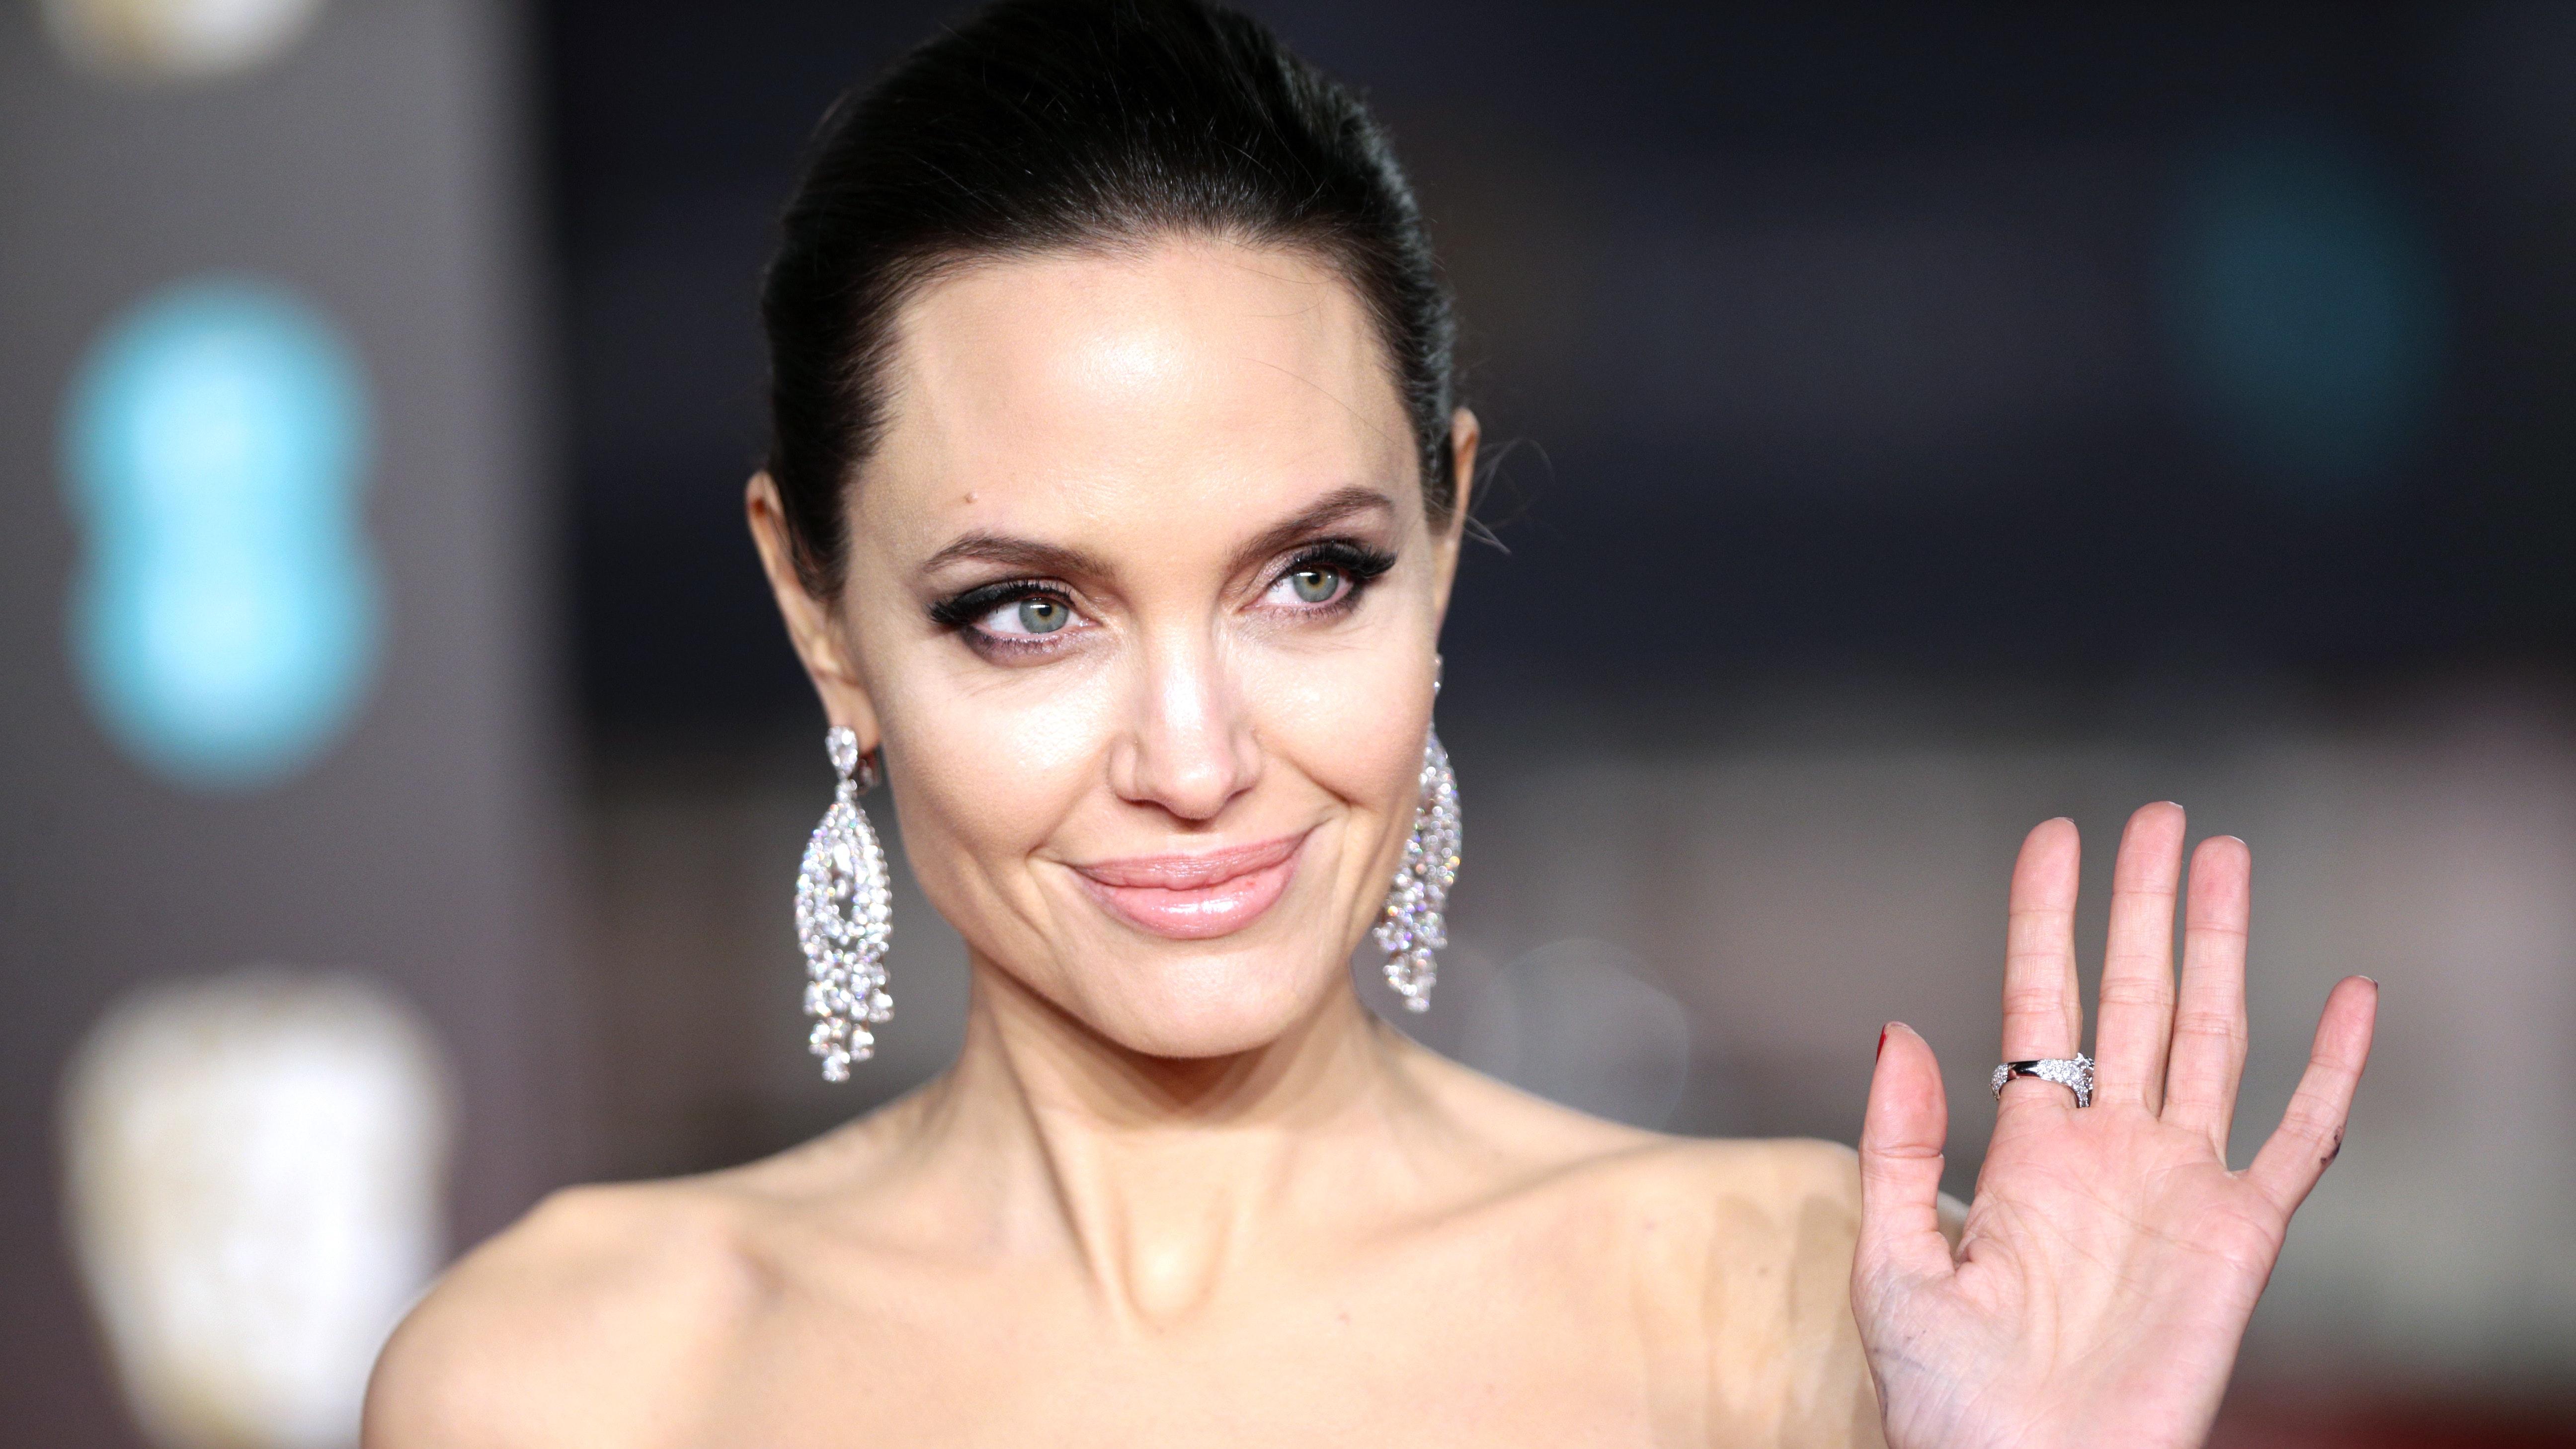 Angelina Jolie Sexy Pics angelina jolie: having a mind on fire is sexy | bt